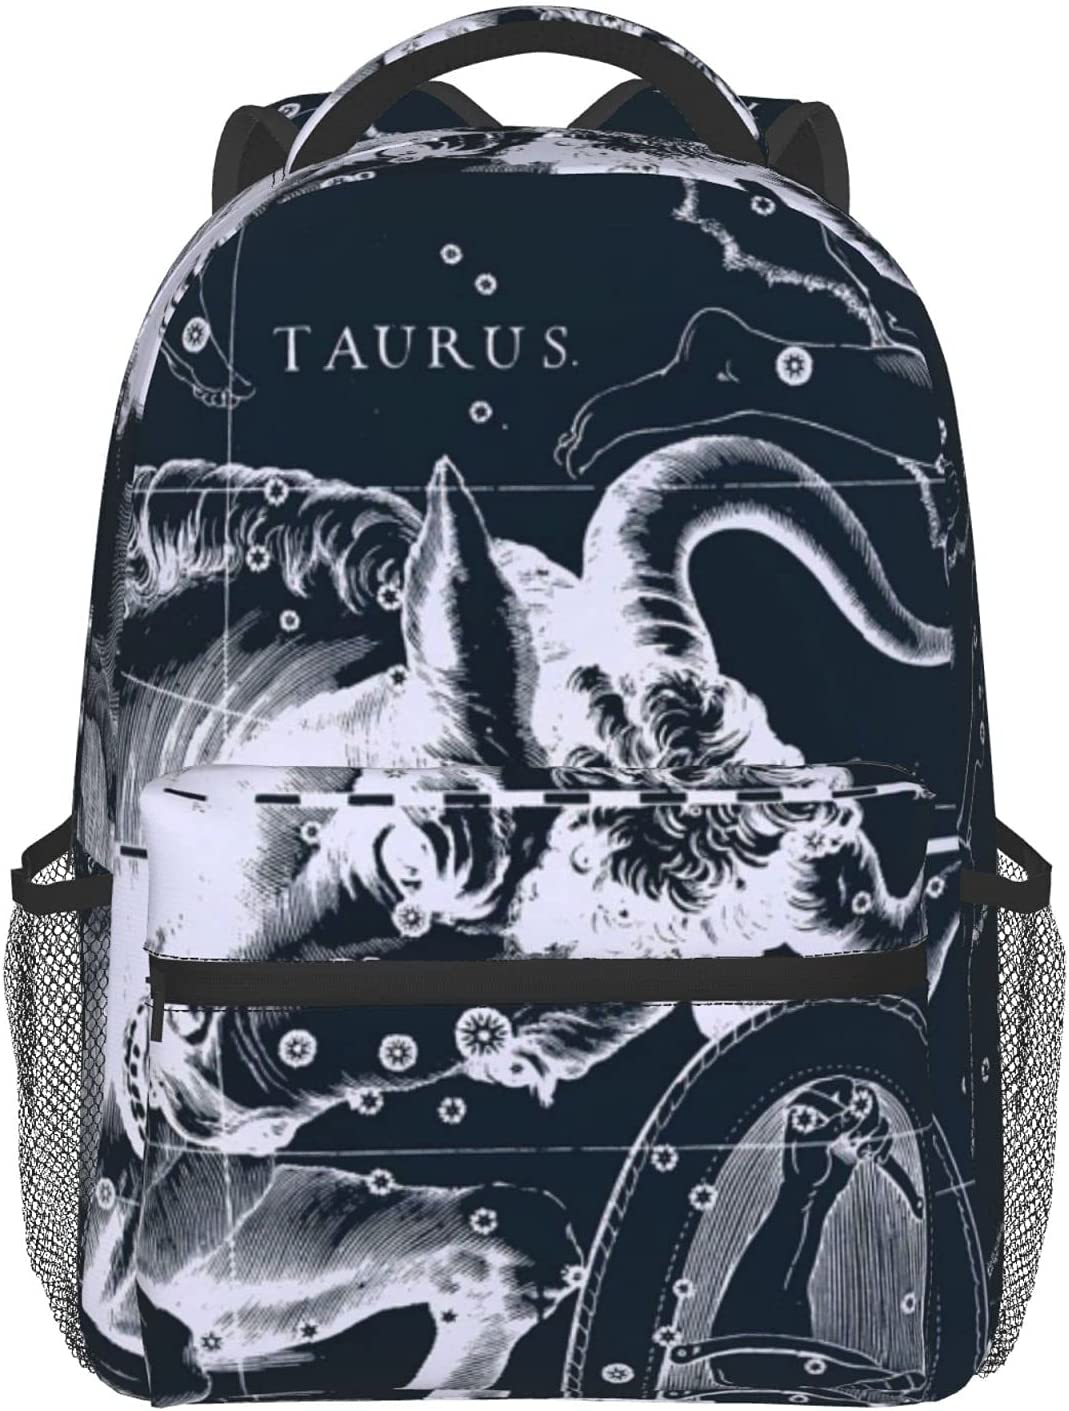 Taurus Constellation Full Print Durabl Schoolbag store polyester 100% Oklahoma City Mall